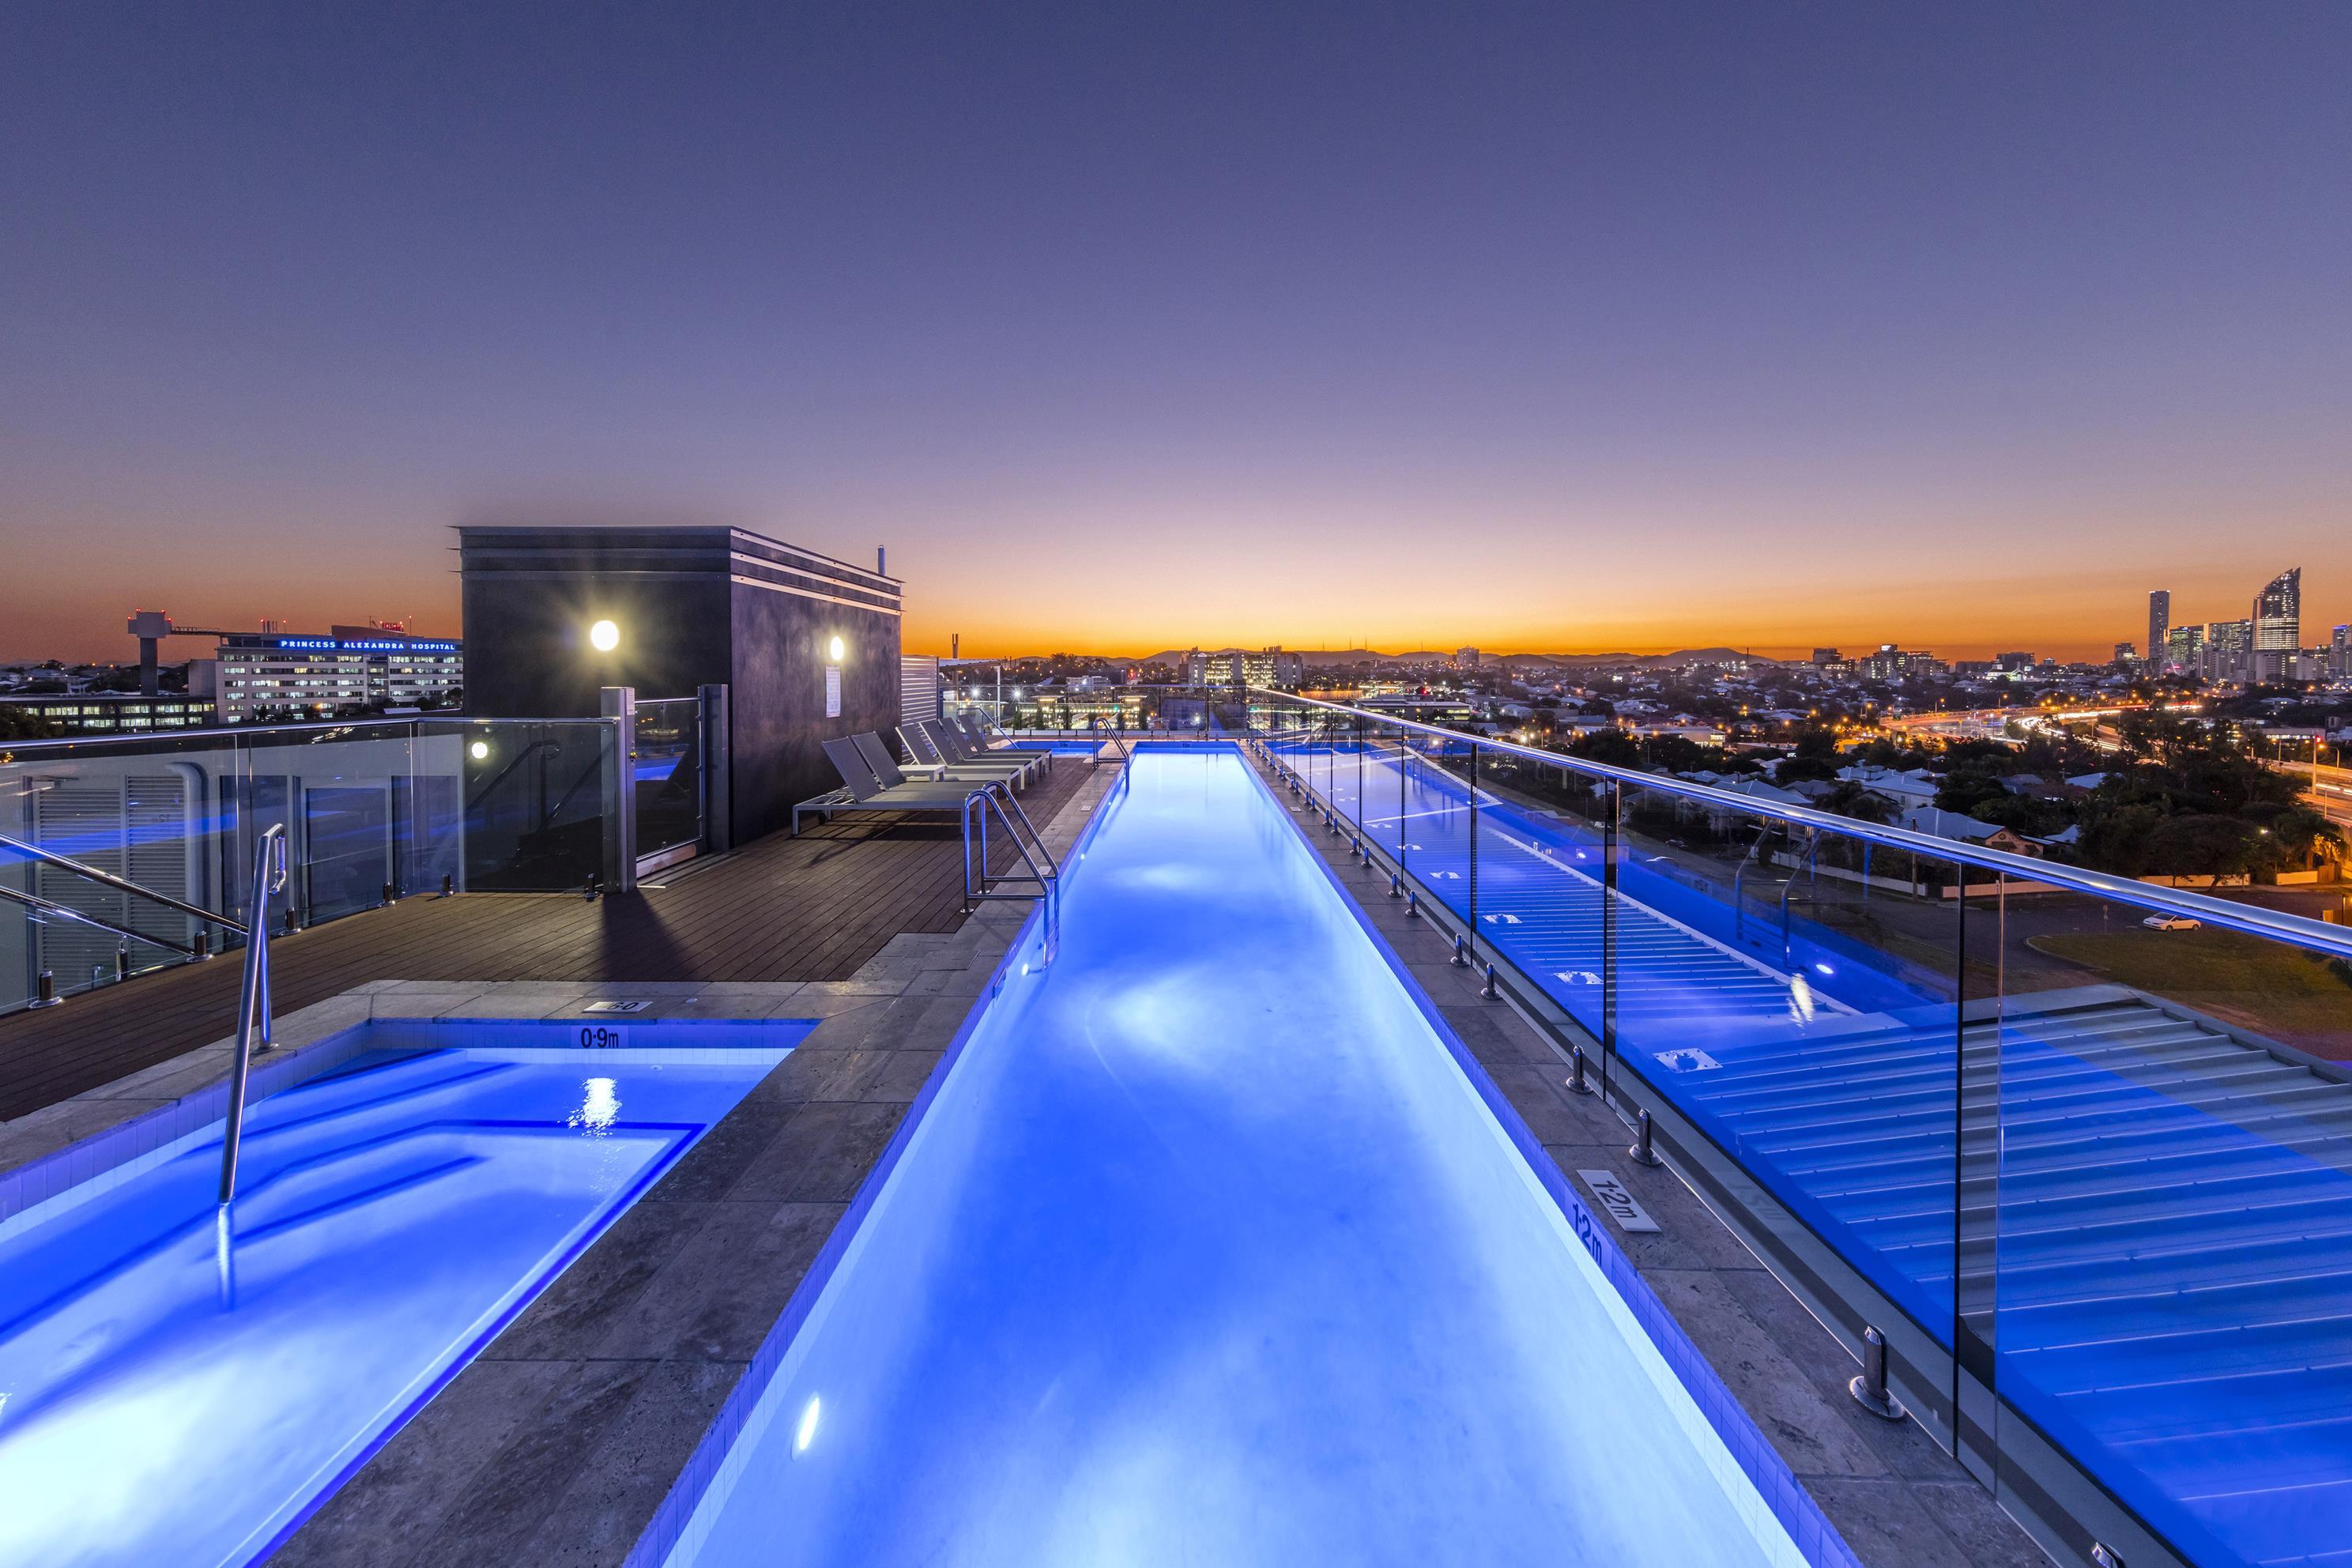 Oaks-Woolloongabba-Rooftop-Swimming-Pool-3_low res